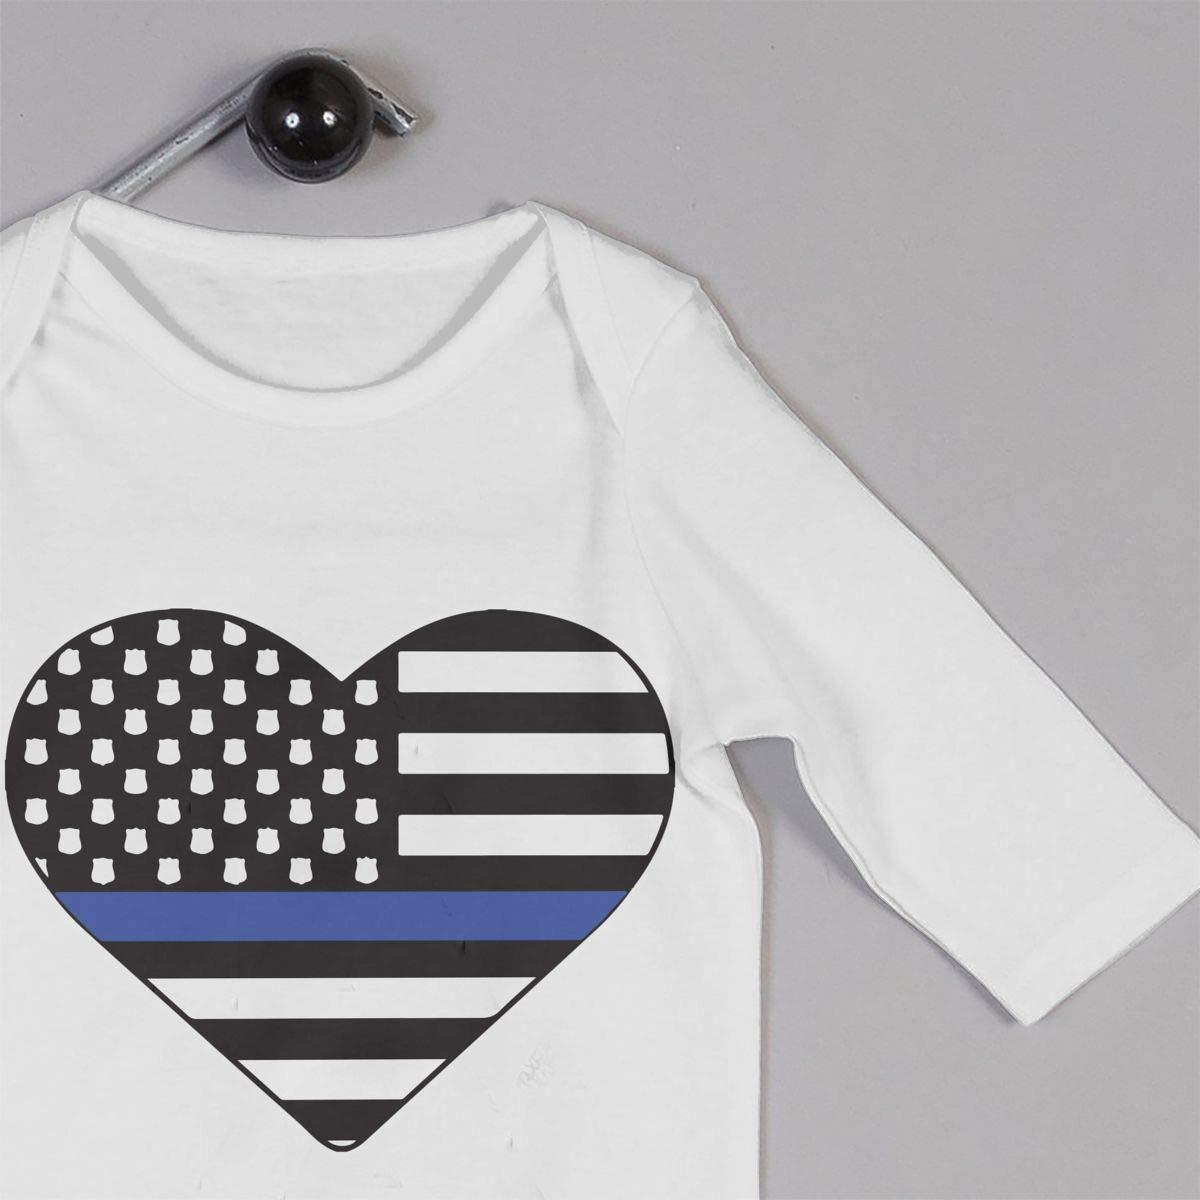 Mri-le1 Newborn Baby Jumpsuit Police Thin Blue Line Hear Infant Long Sleeve Romper Jumpsuit